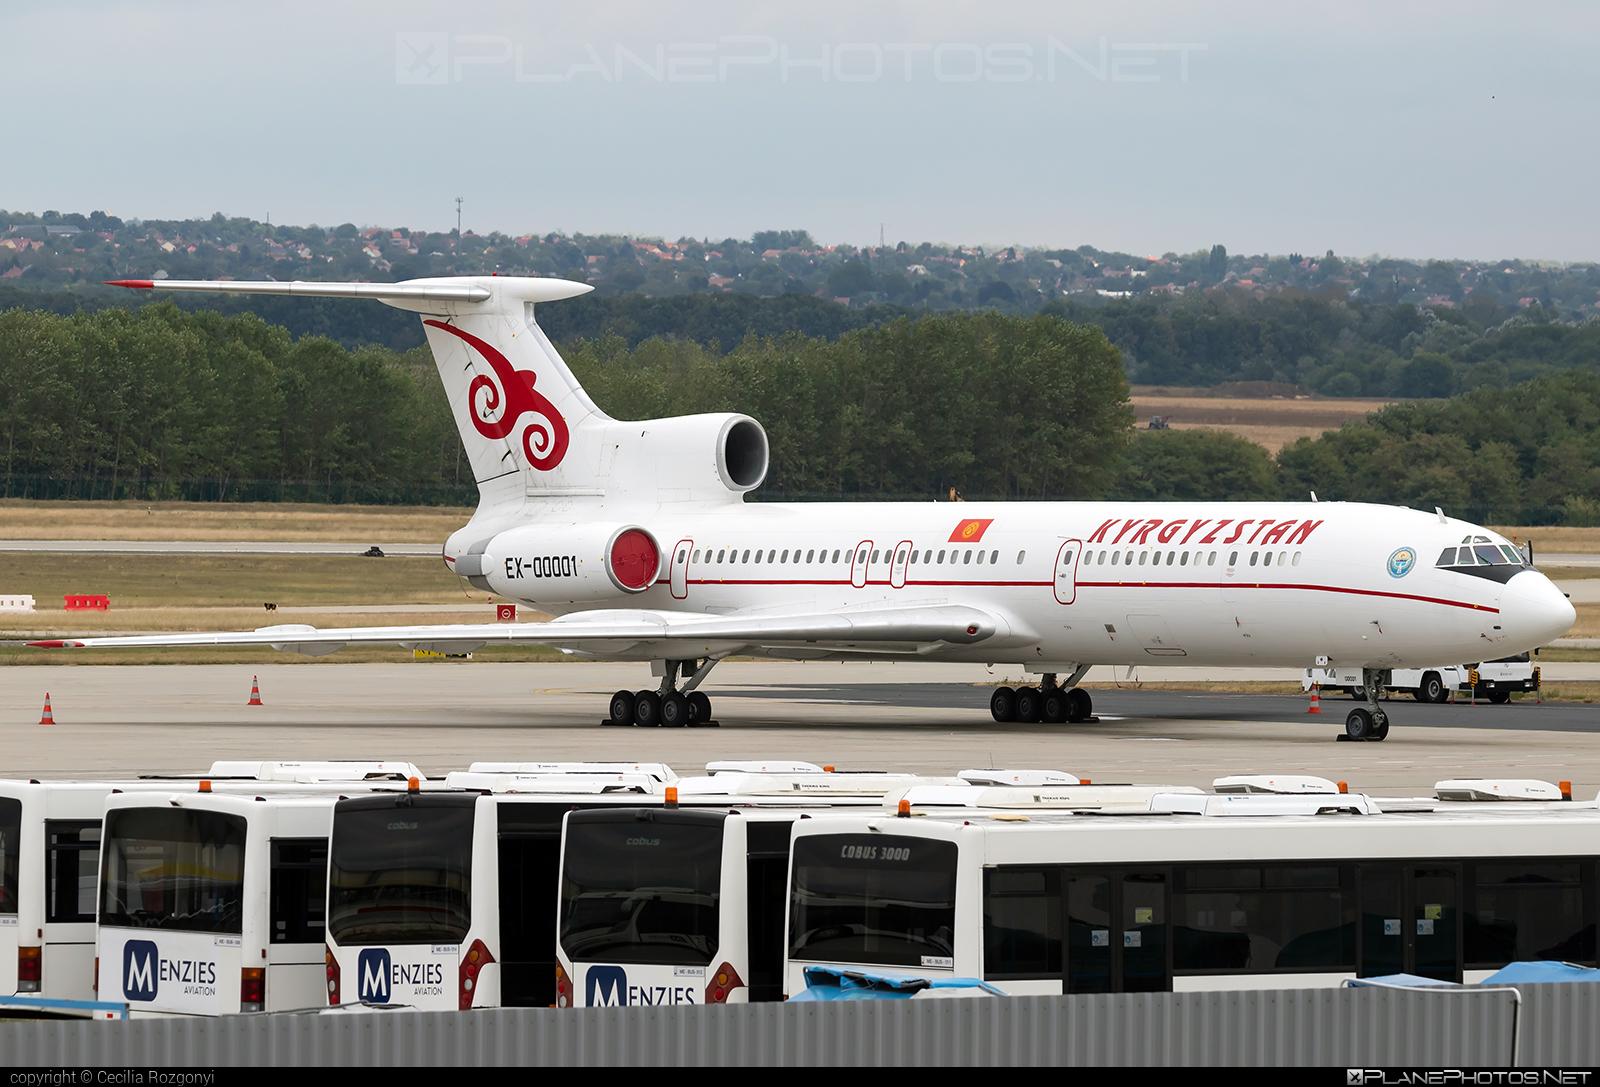 Tupolev Tu-154M - EX-00001 operated by Kyrgyzstan Airlines #tu154 #tu154m #tupolev